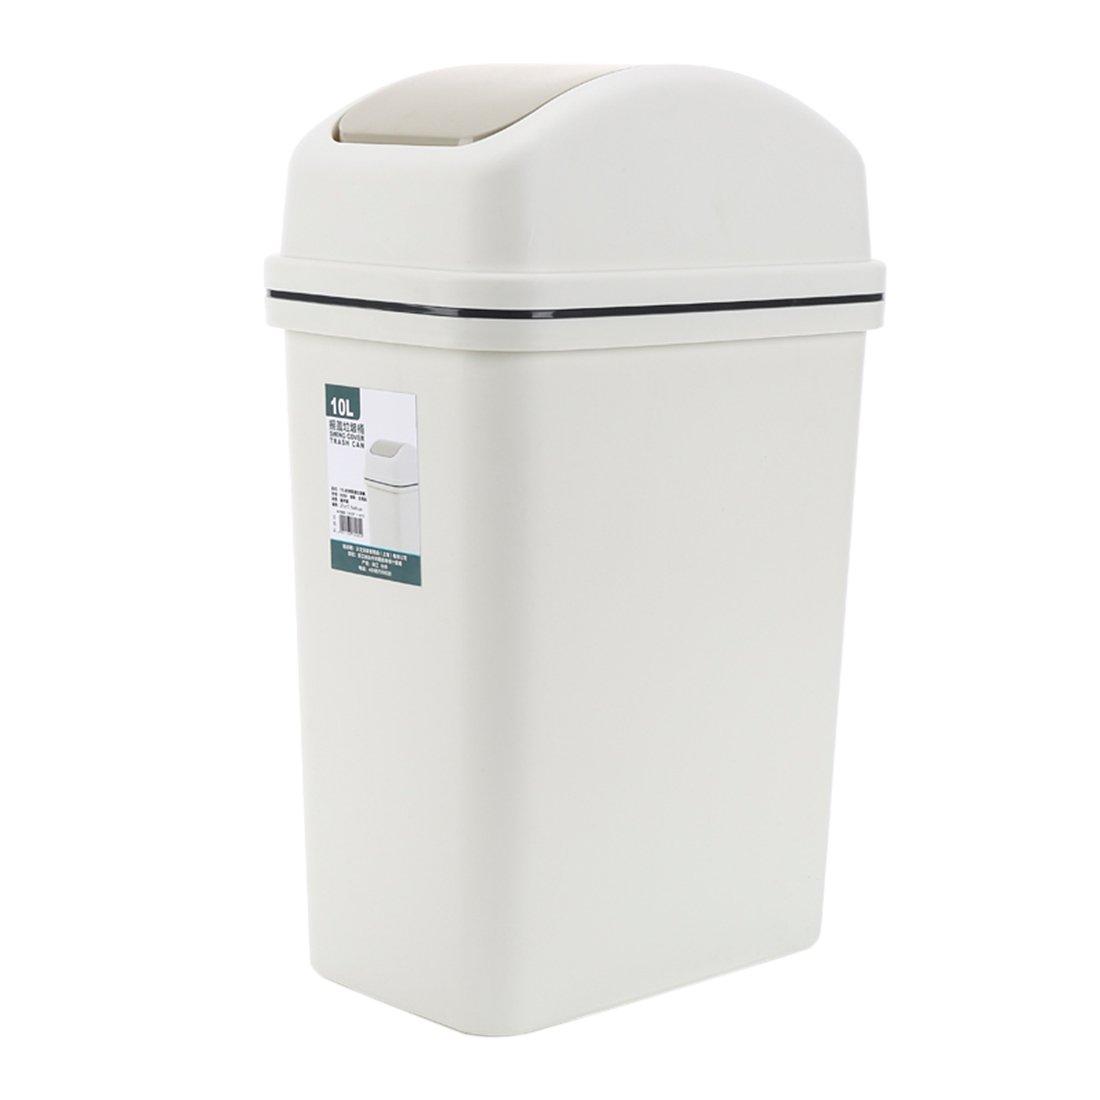 Lingxuinfo 10L Trash Can Wastebasket Waste Bin Trash Bin Waste Paper Basket Dustbin Garbage Can with Lid for Home, Kitchen, Office - Grey